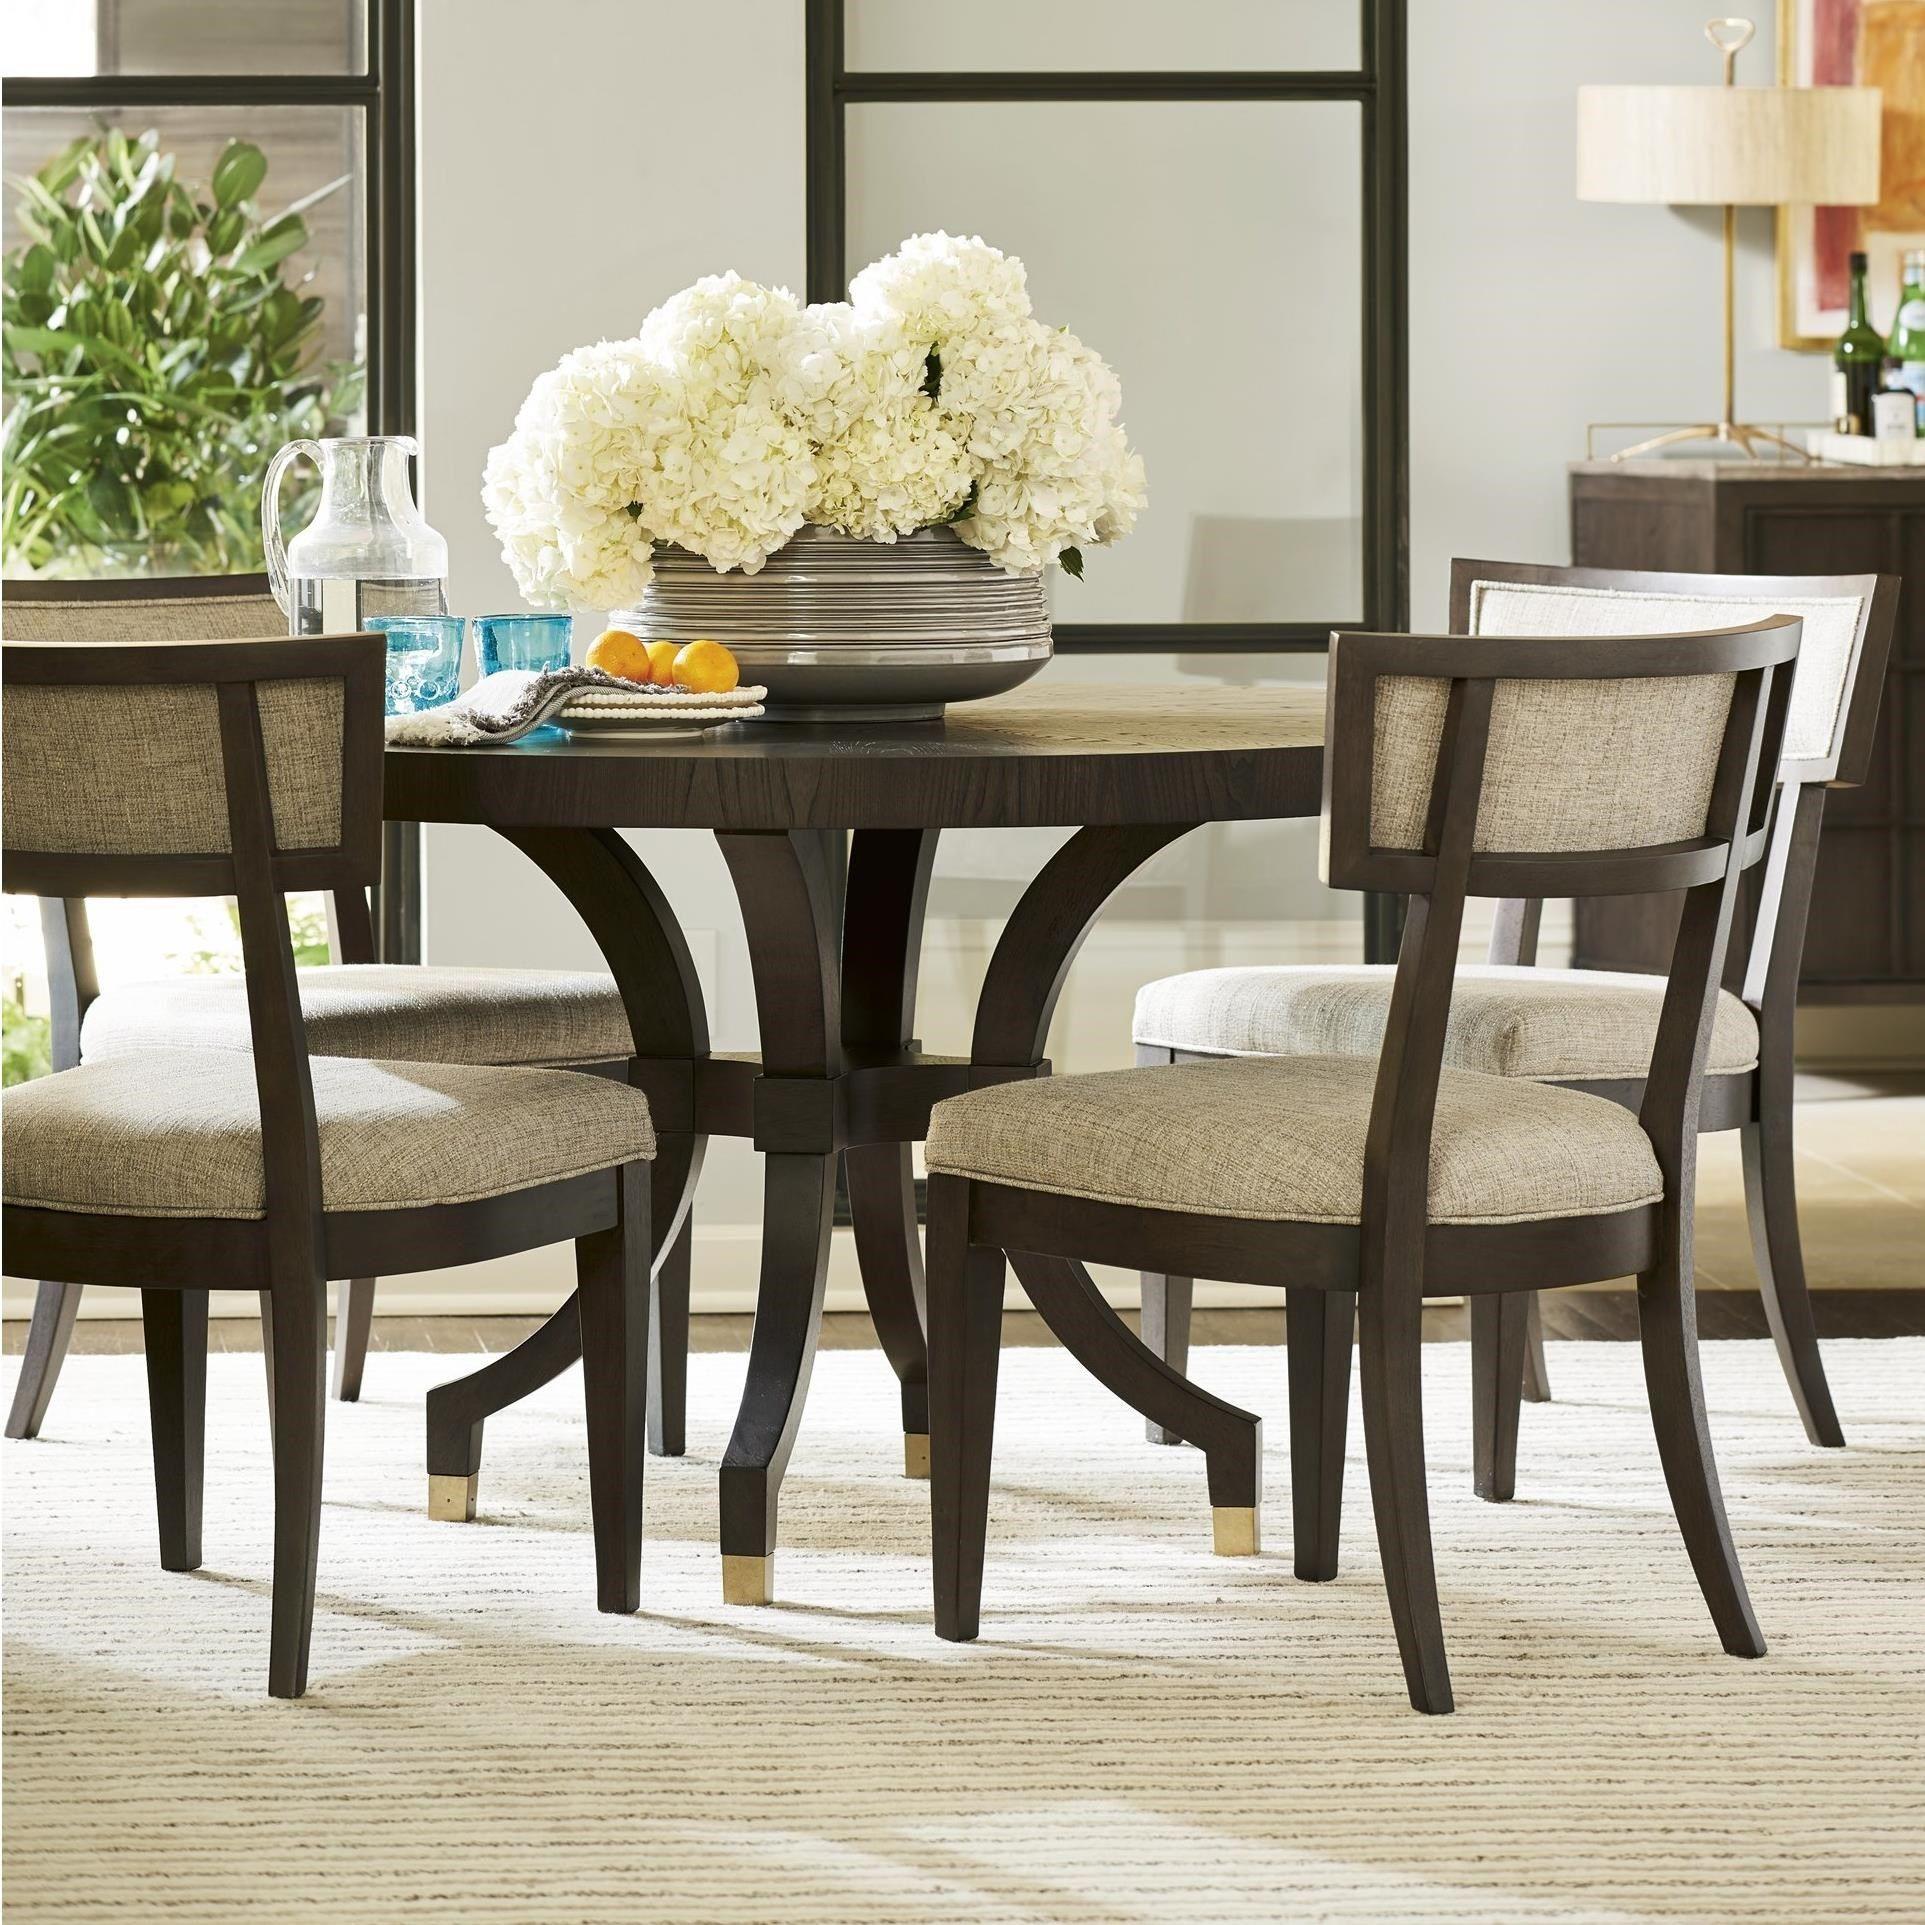 15+ Dining room sets naples fl Inspiration